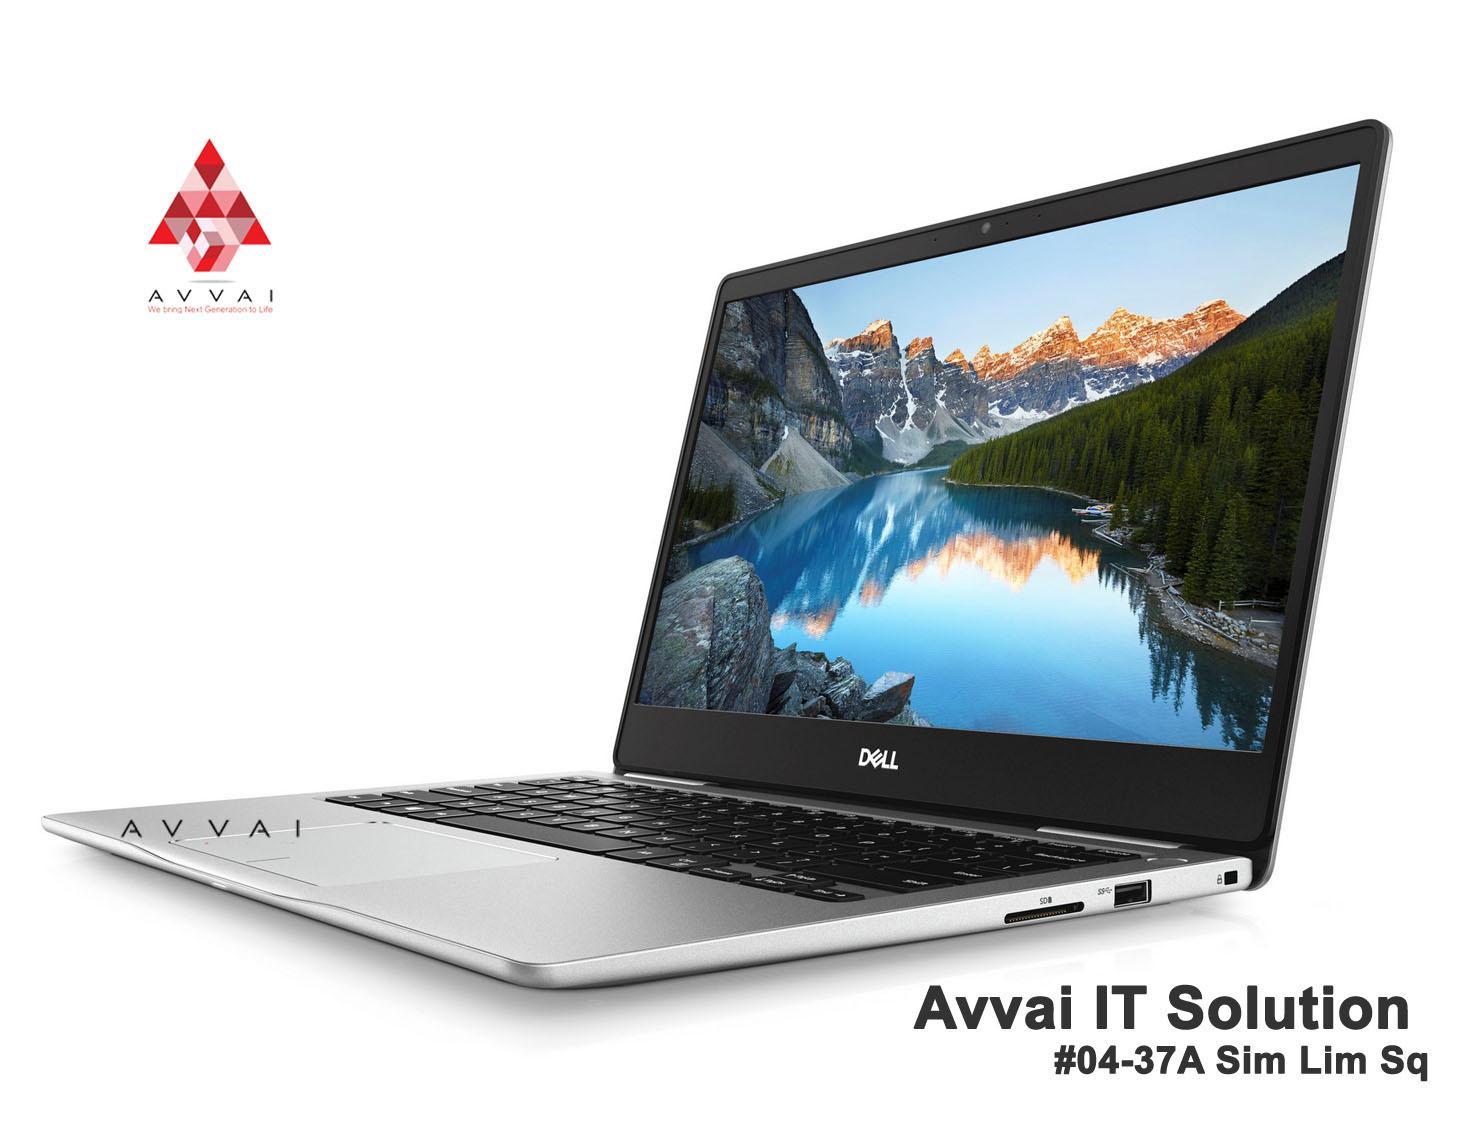 [ LATEST ARRIVAL-2018 ] Dell Inspiron 13 (5378) 5000 Series Laptop 7th Generation Intel Core i7-7500U Processor (3M Cache, up...